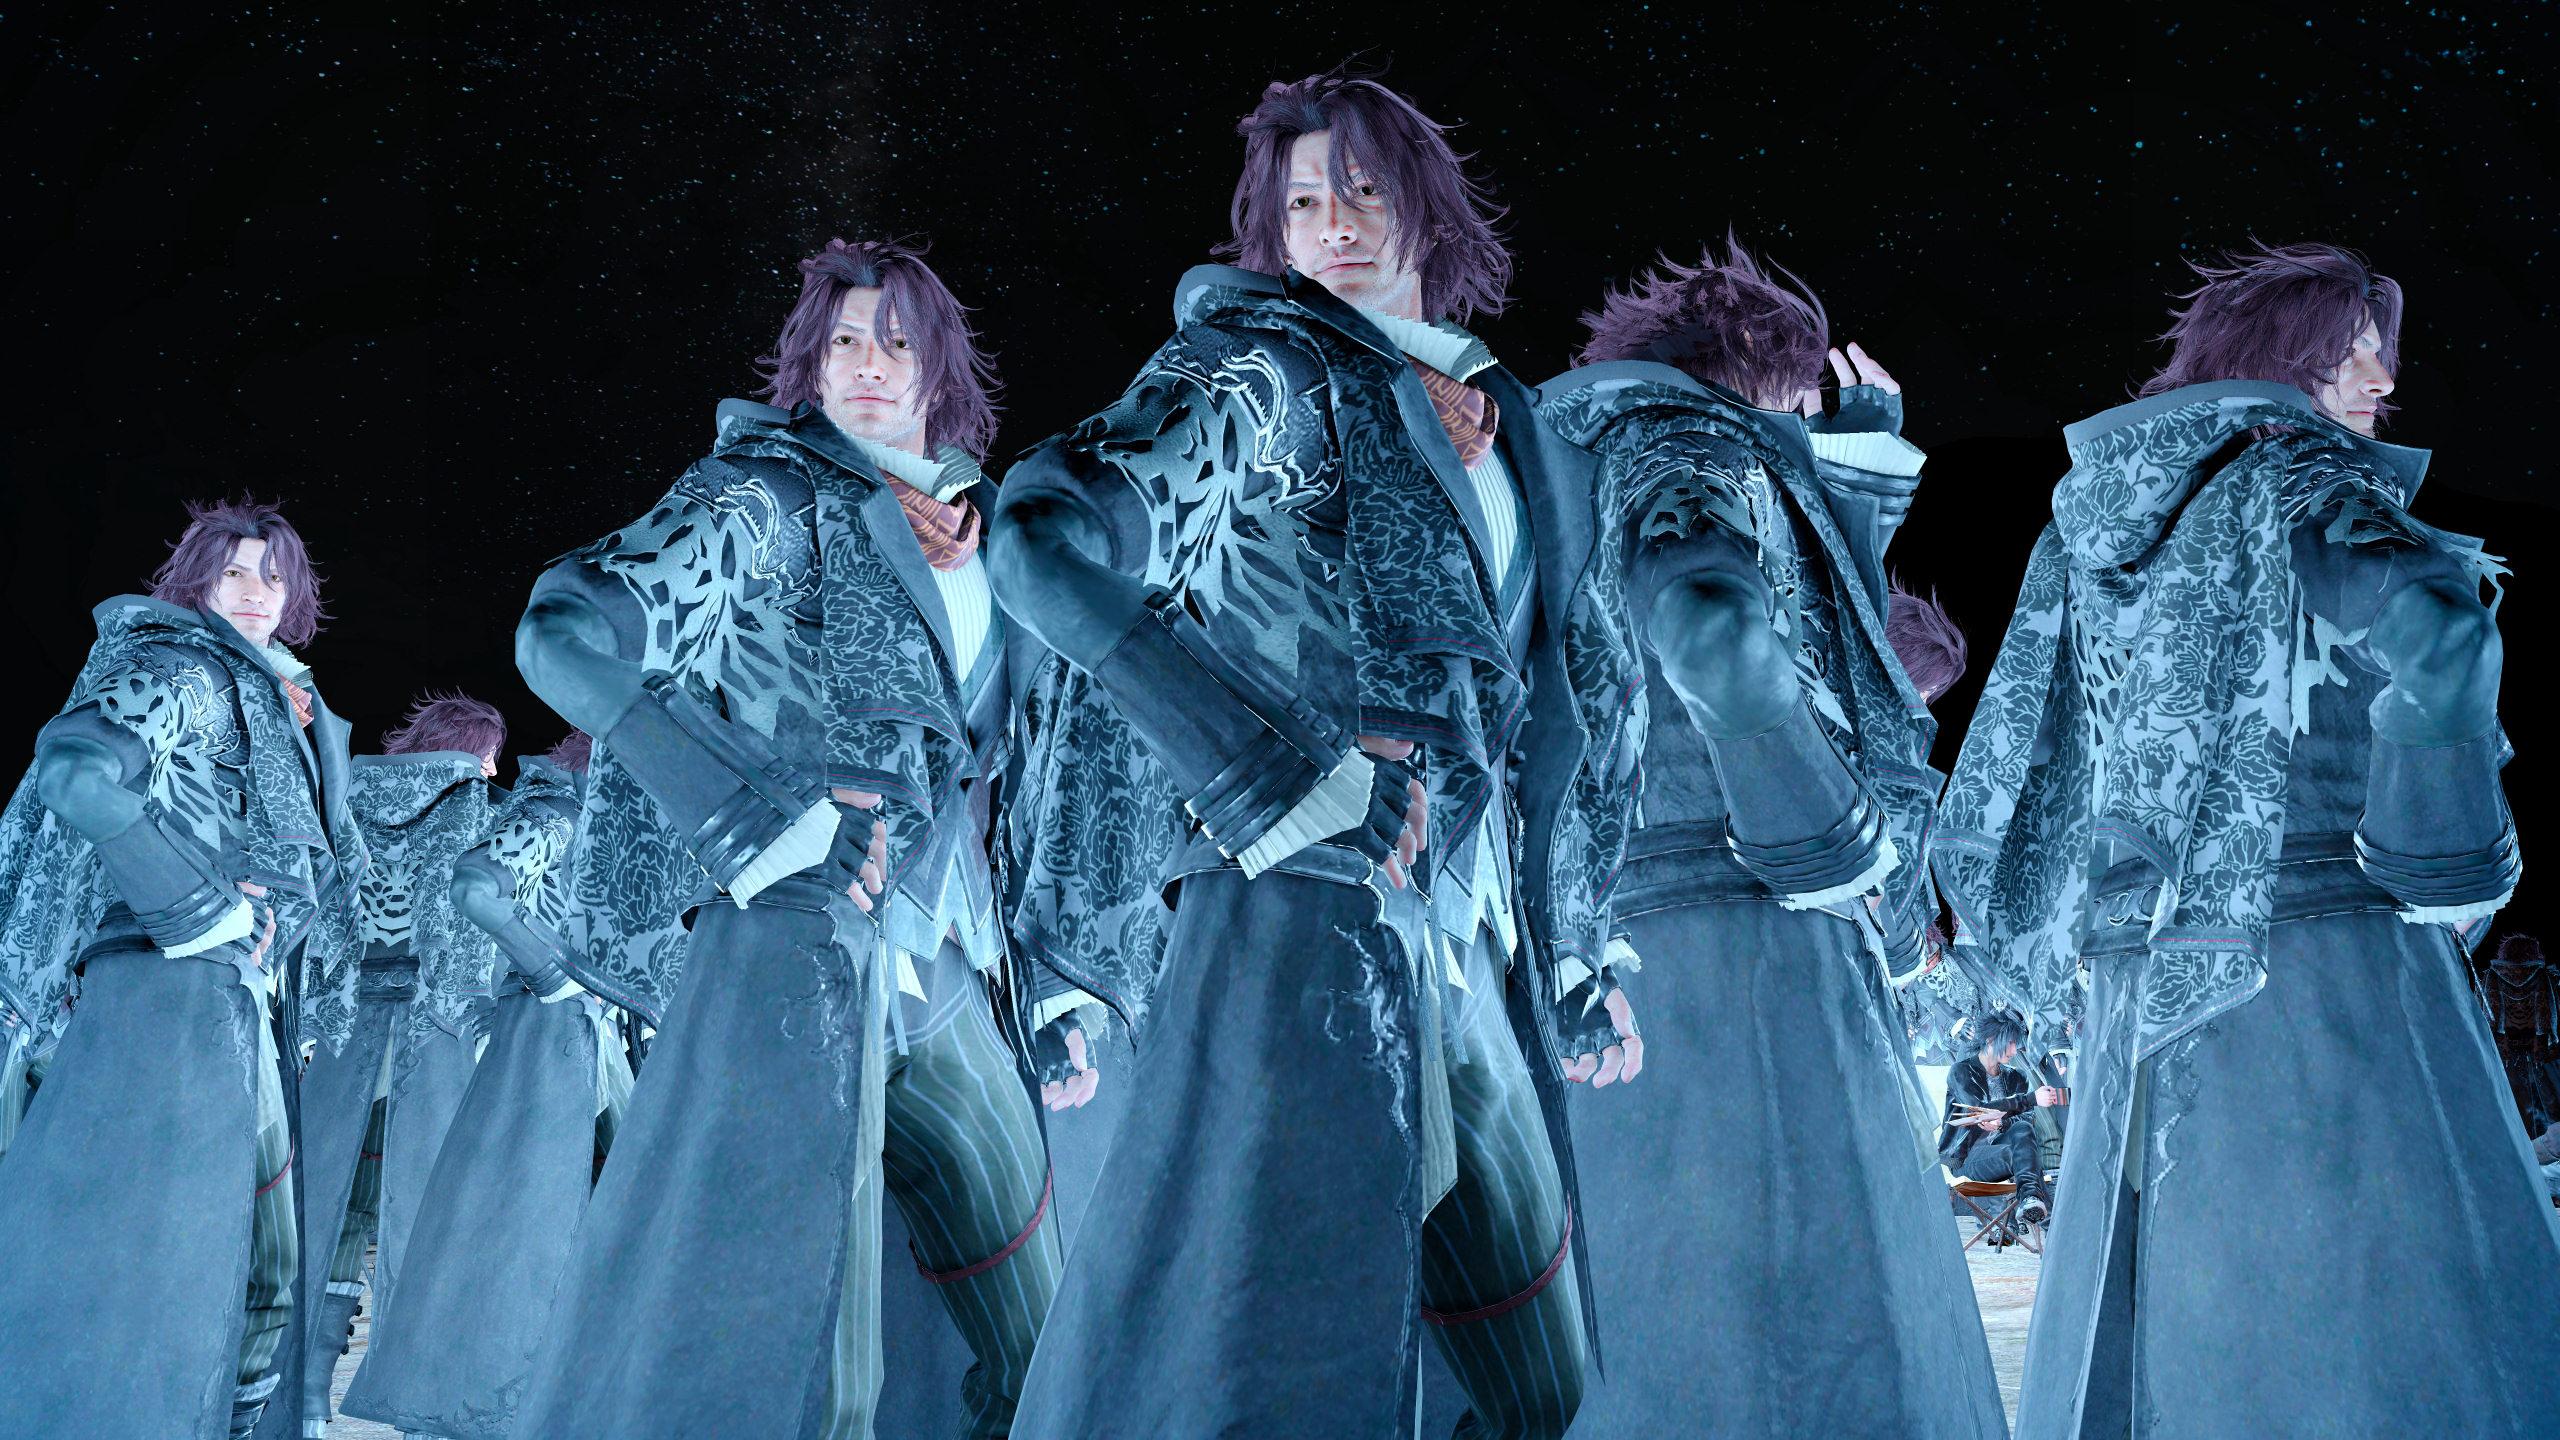 Mod Related – Final Fantasy XV